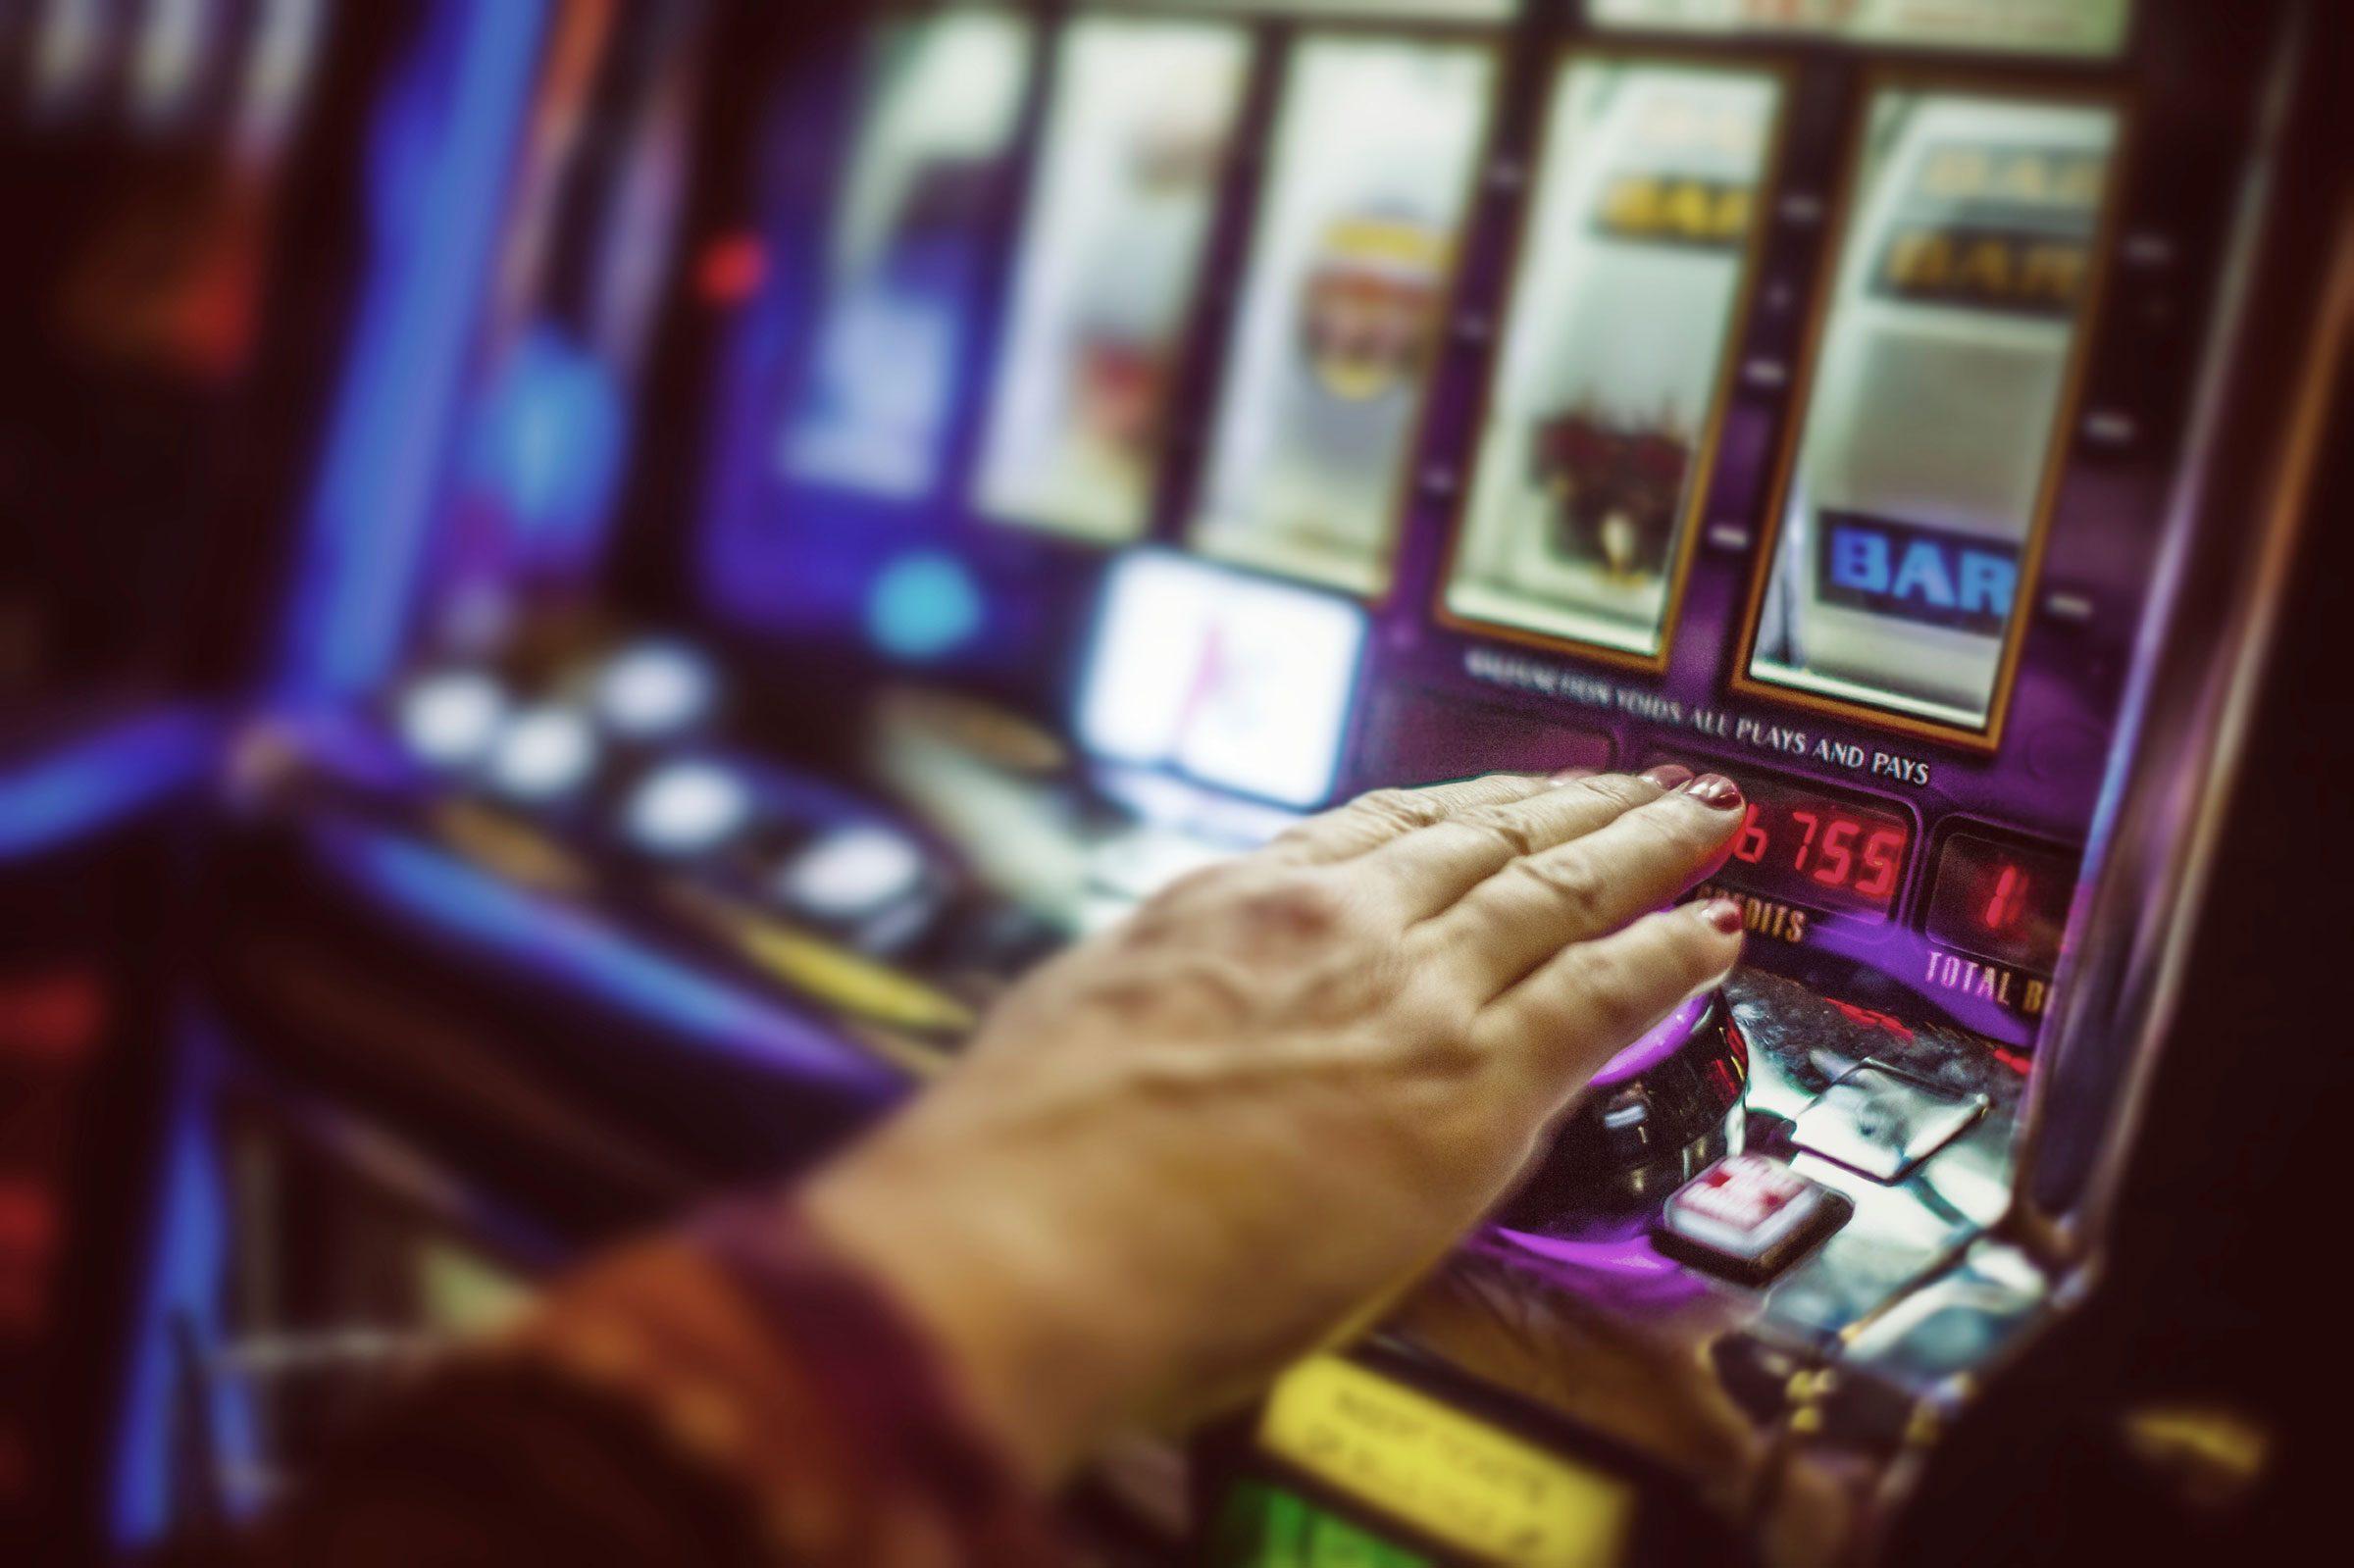 Gambling addict takes b.c.lottery corp.to court fantasy springs casino bingo